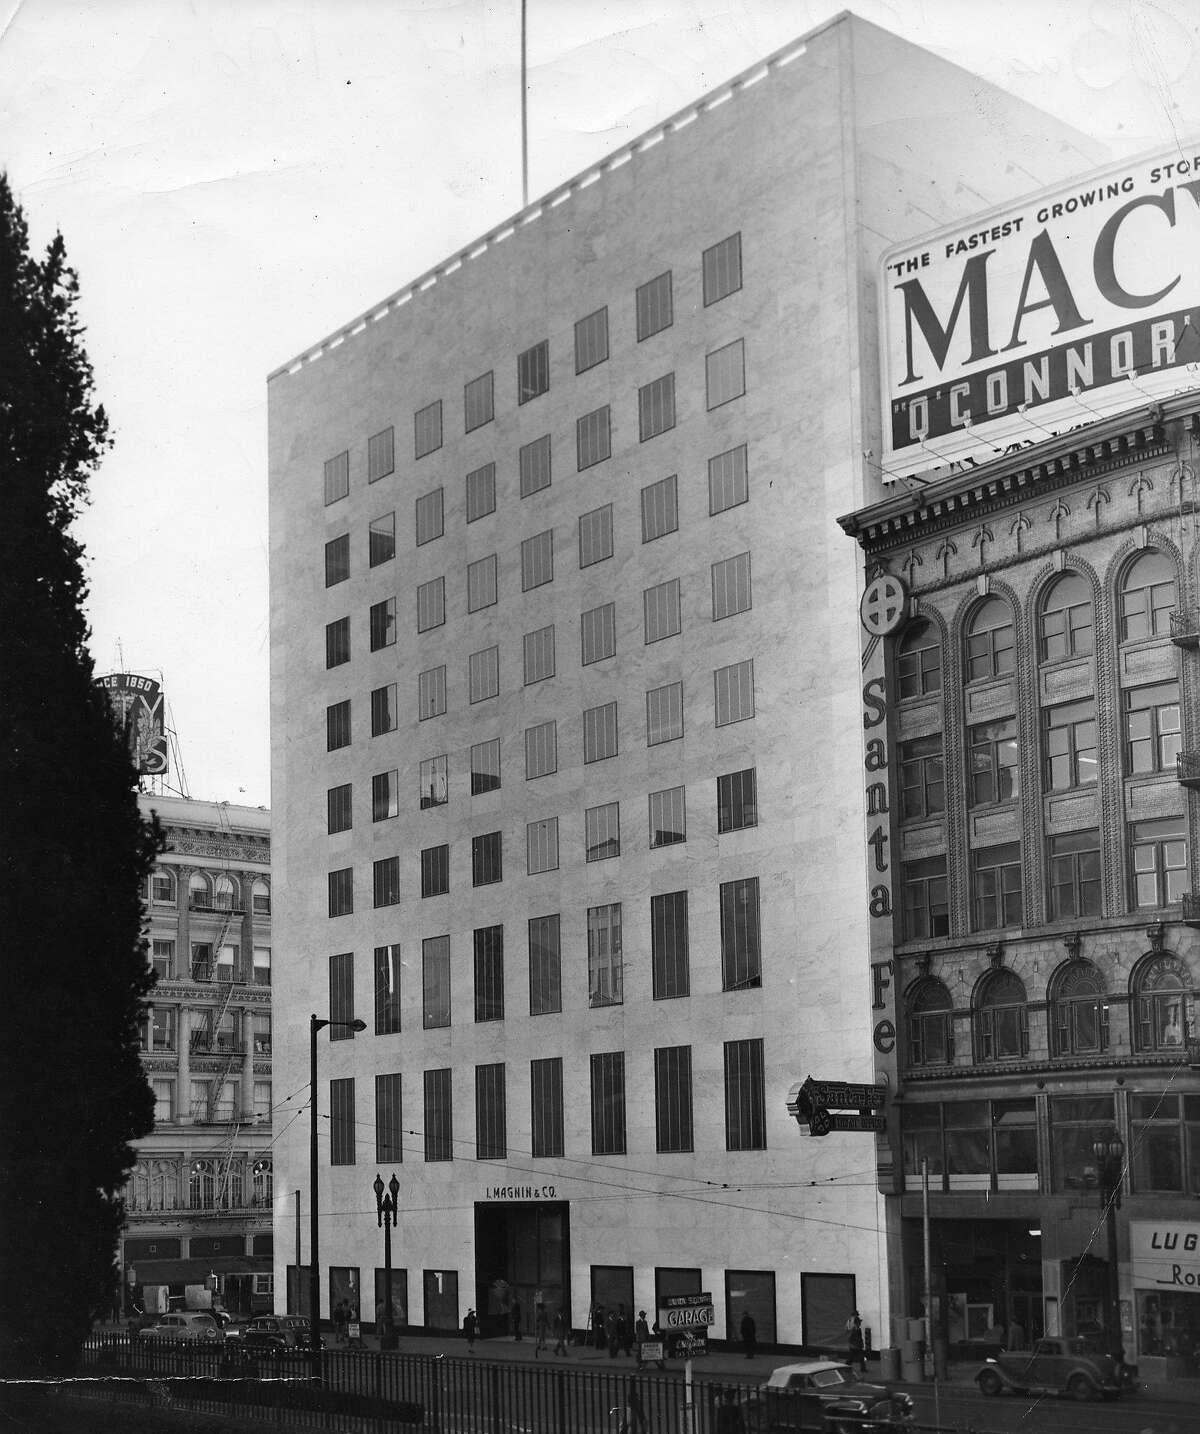 I. Magnin & Co. on Union Square, January 14, 1948